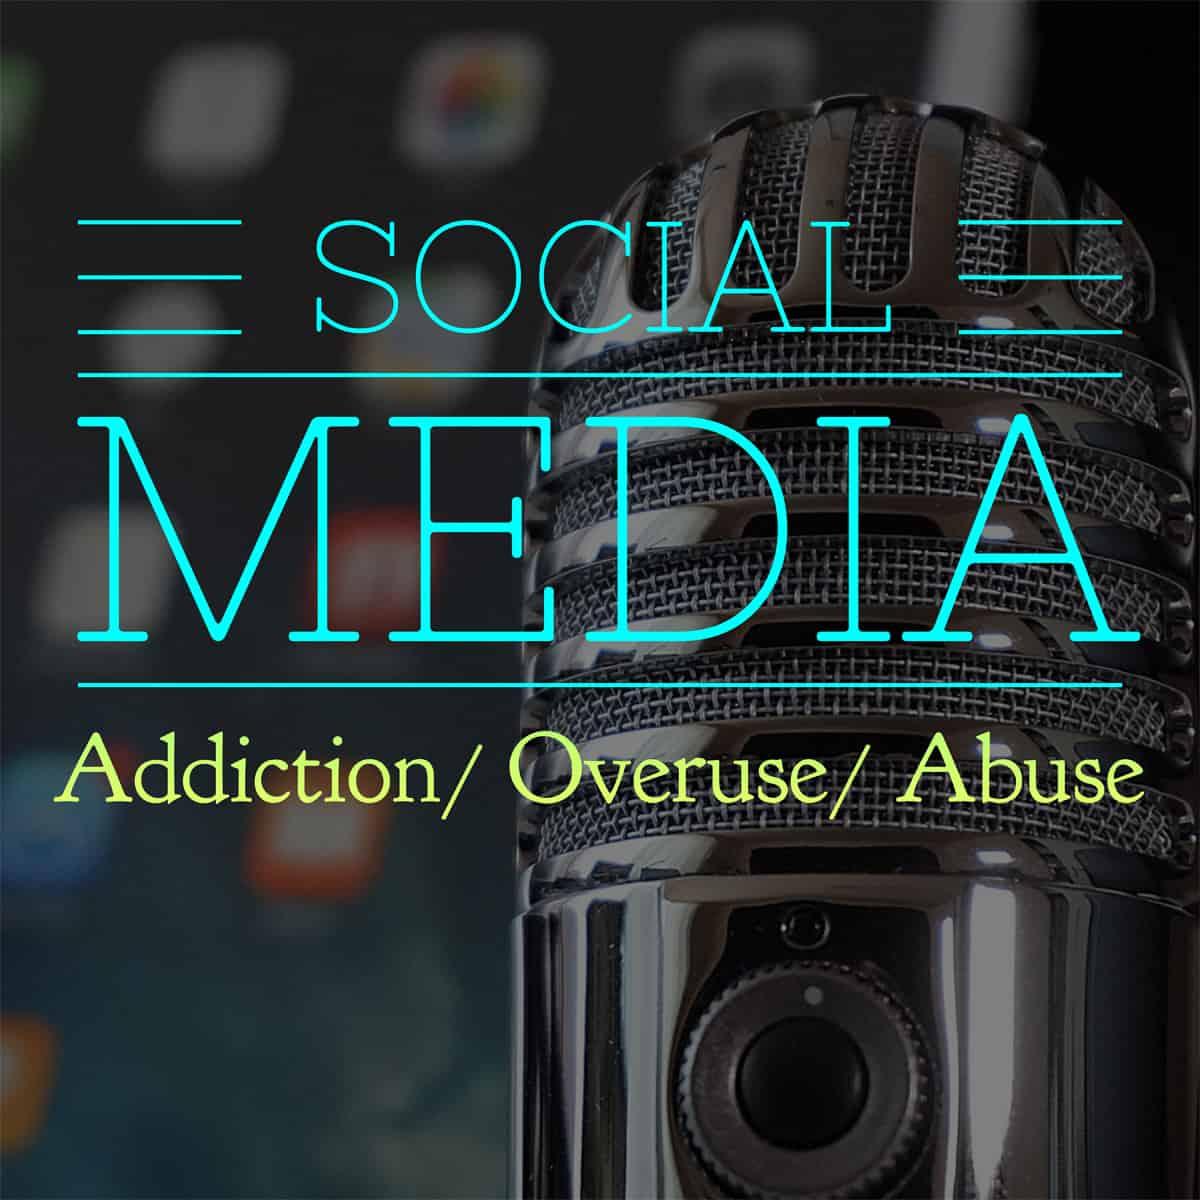 Ep. 56: Social Media Addiction, Overuse, and Abuse